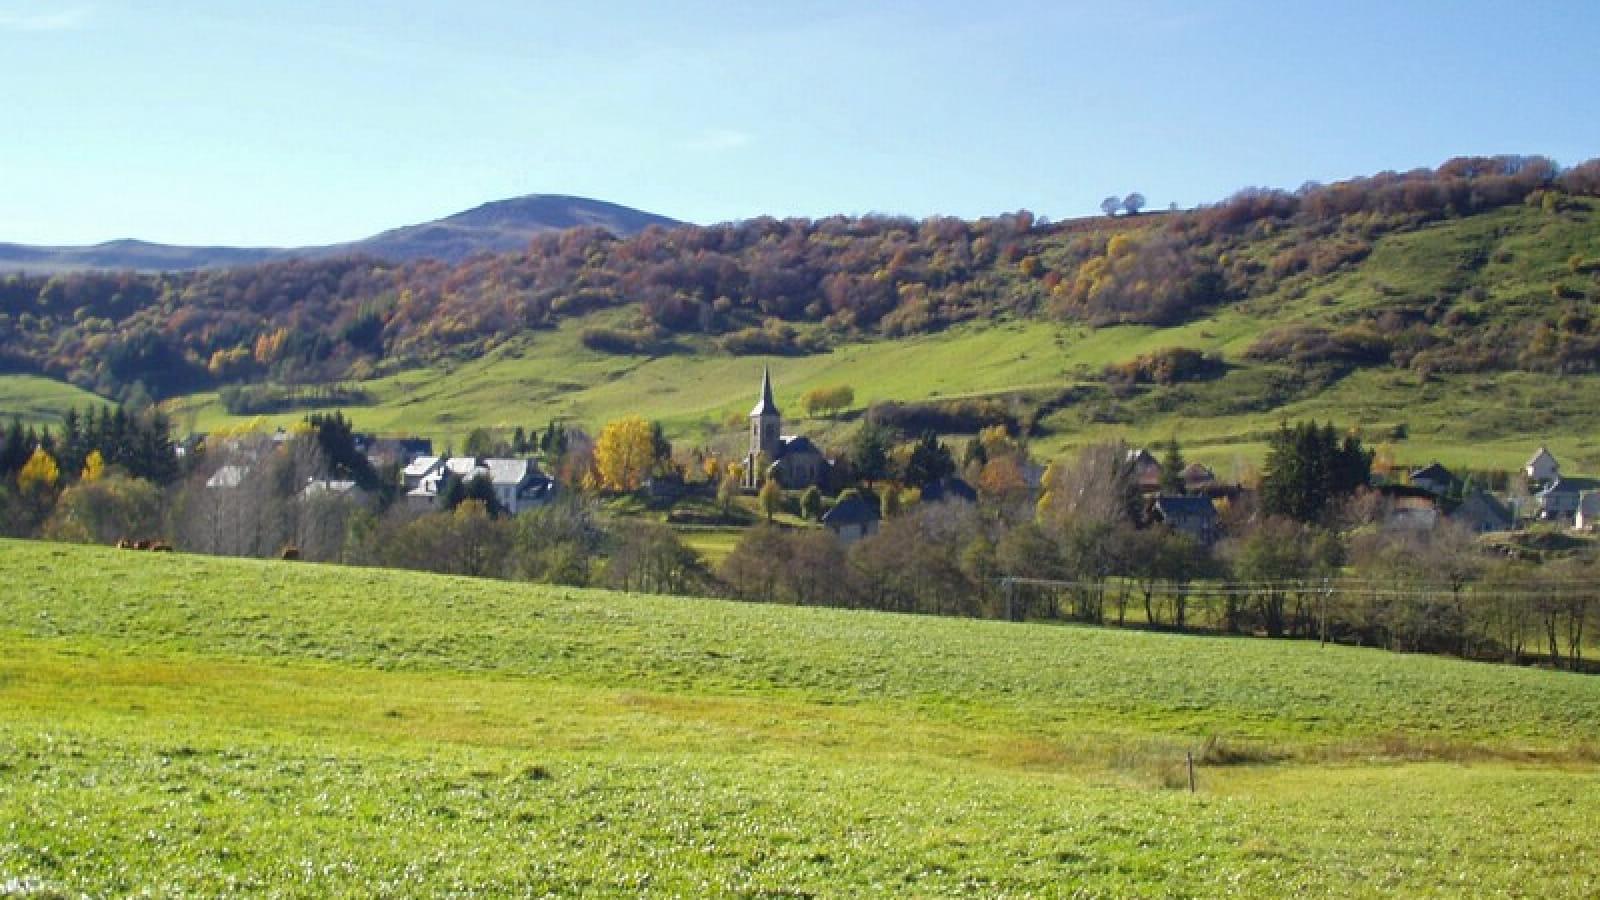 Le Bois Mary (Réseau VTT du Puy-Mary)